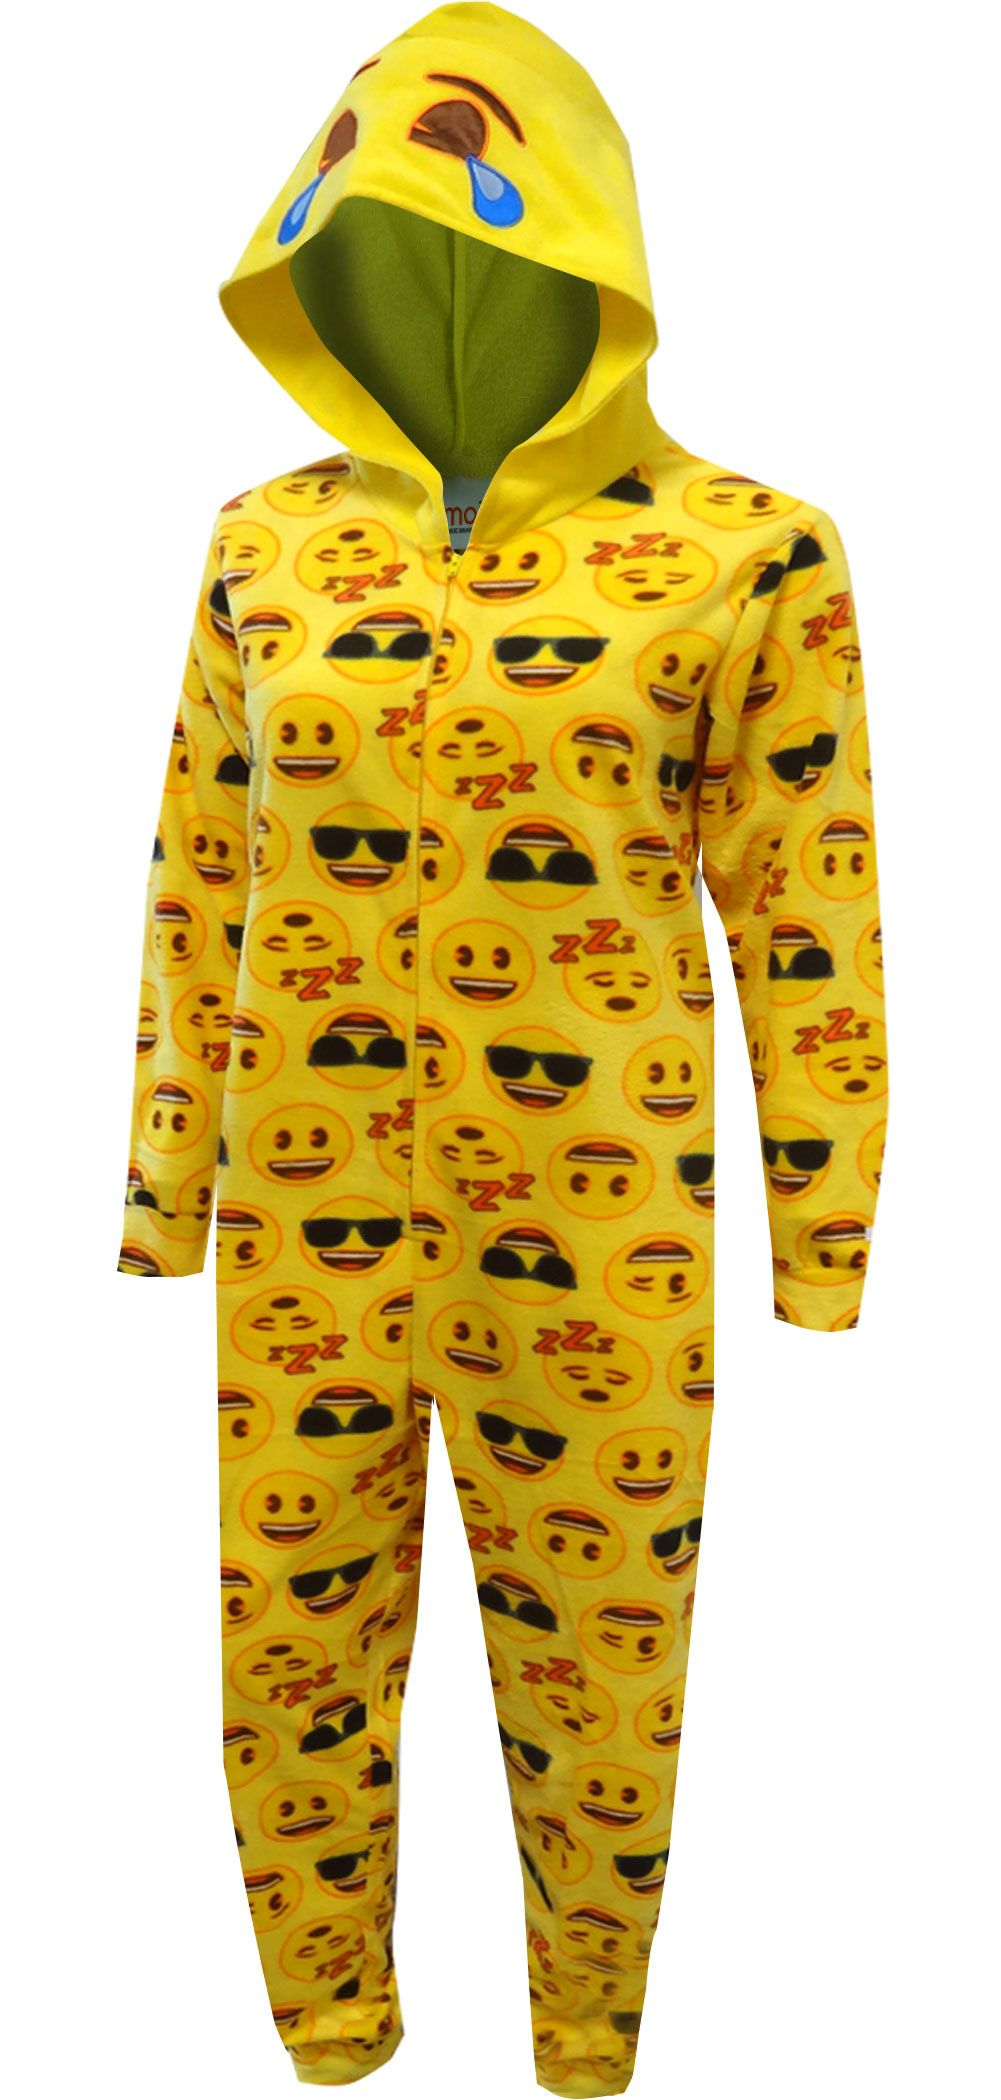 6ba87ba57995 LOL Emoji Hooded One Piece Pajama